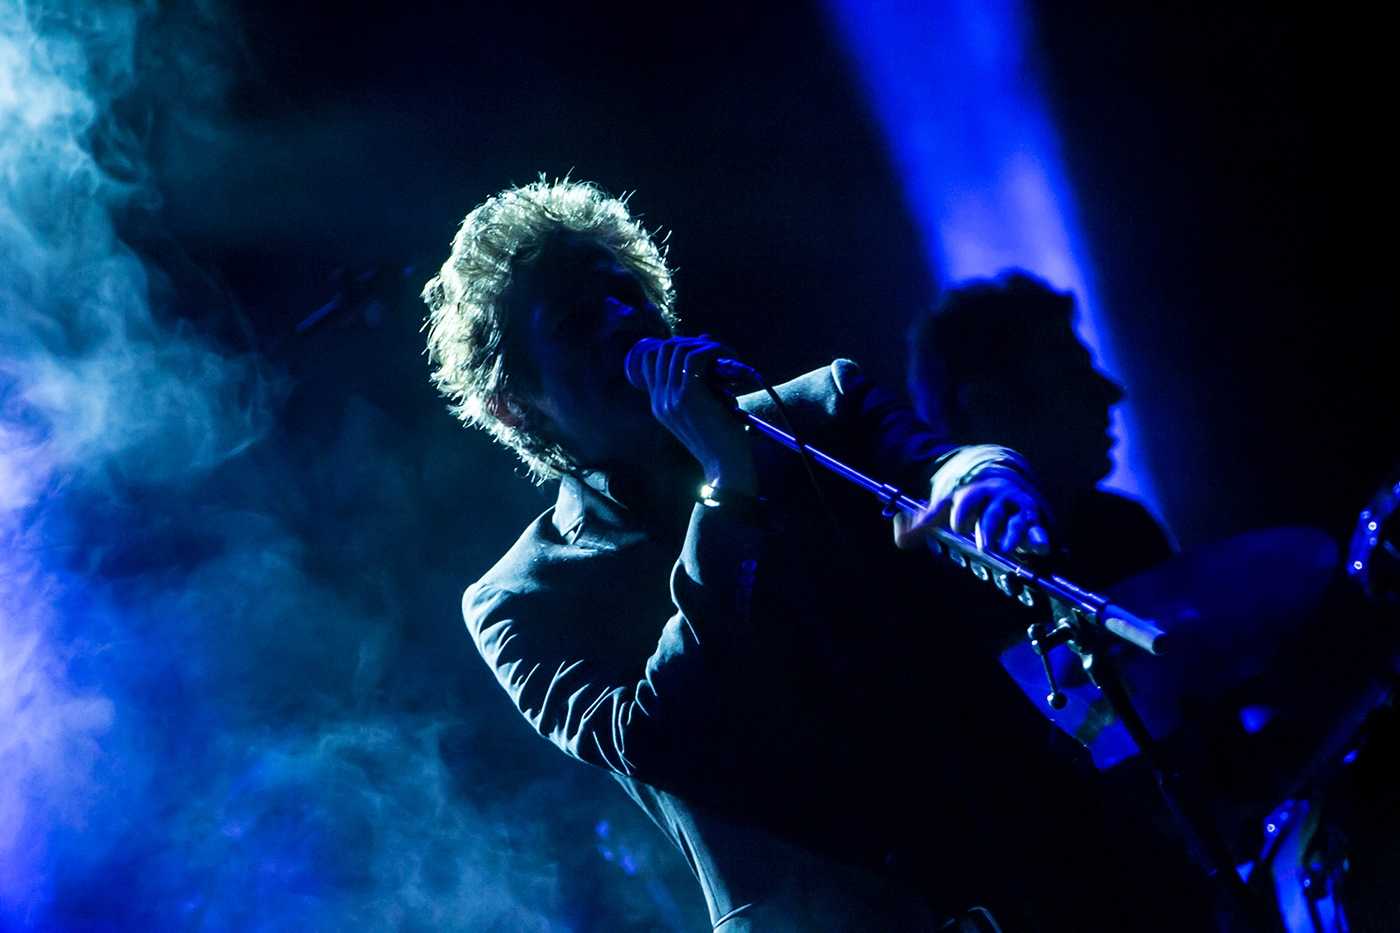 photographe-reportage-festival-rockadel-guillaume-heraud-038-small